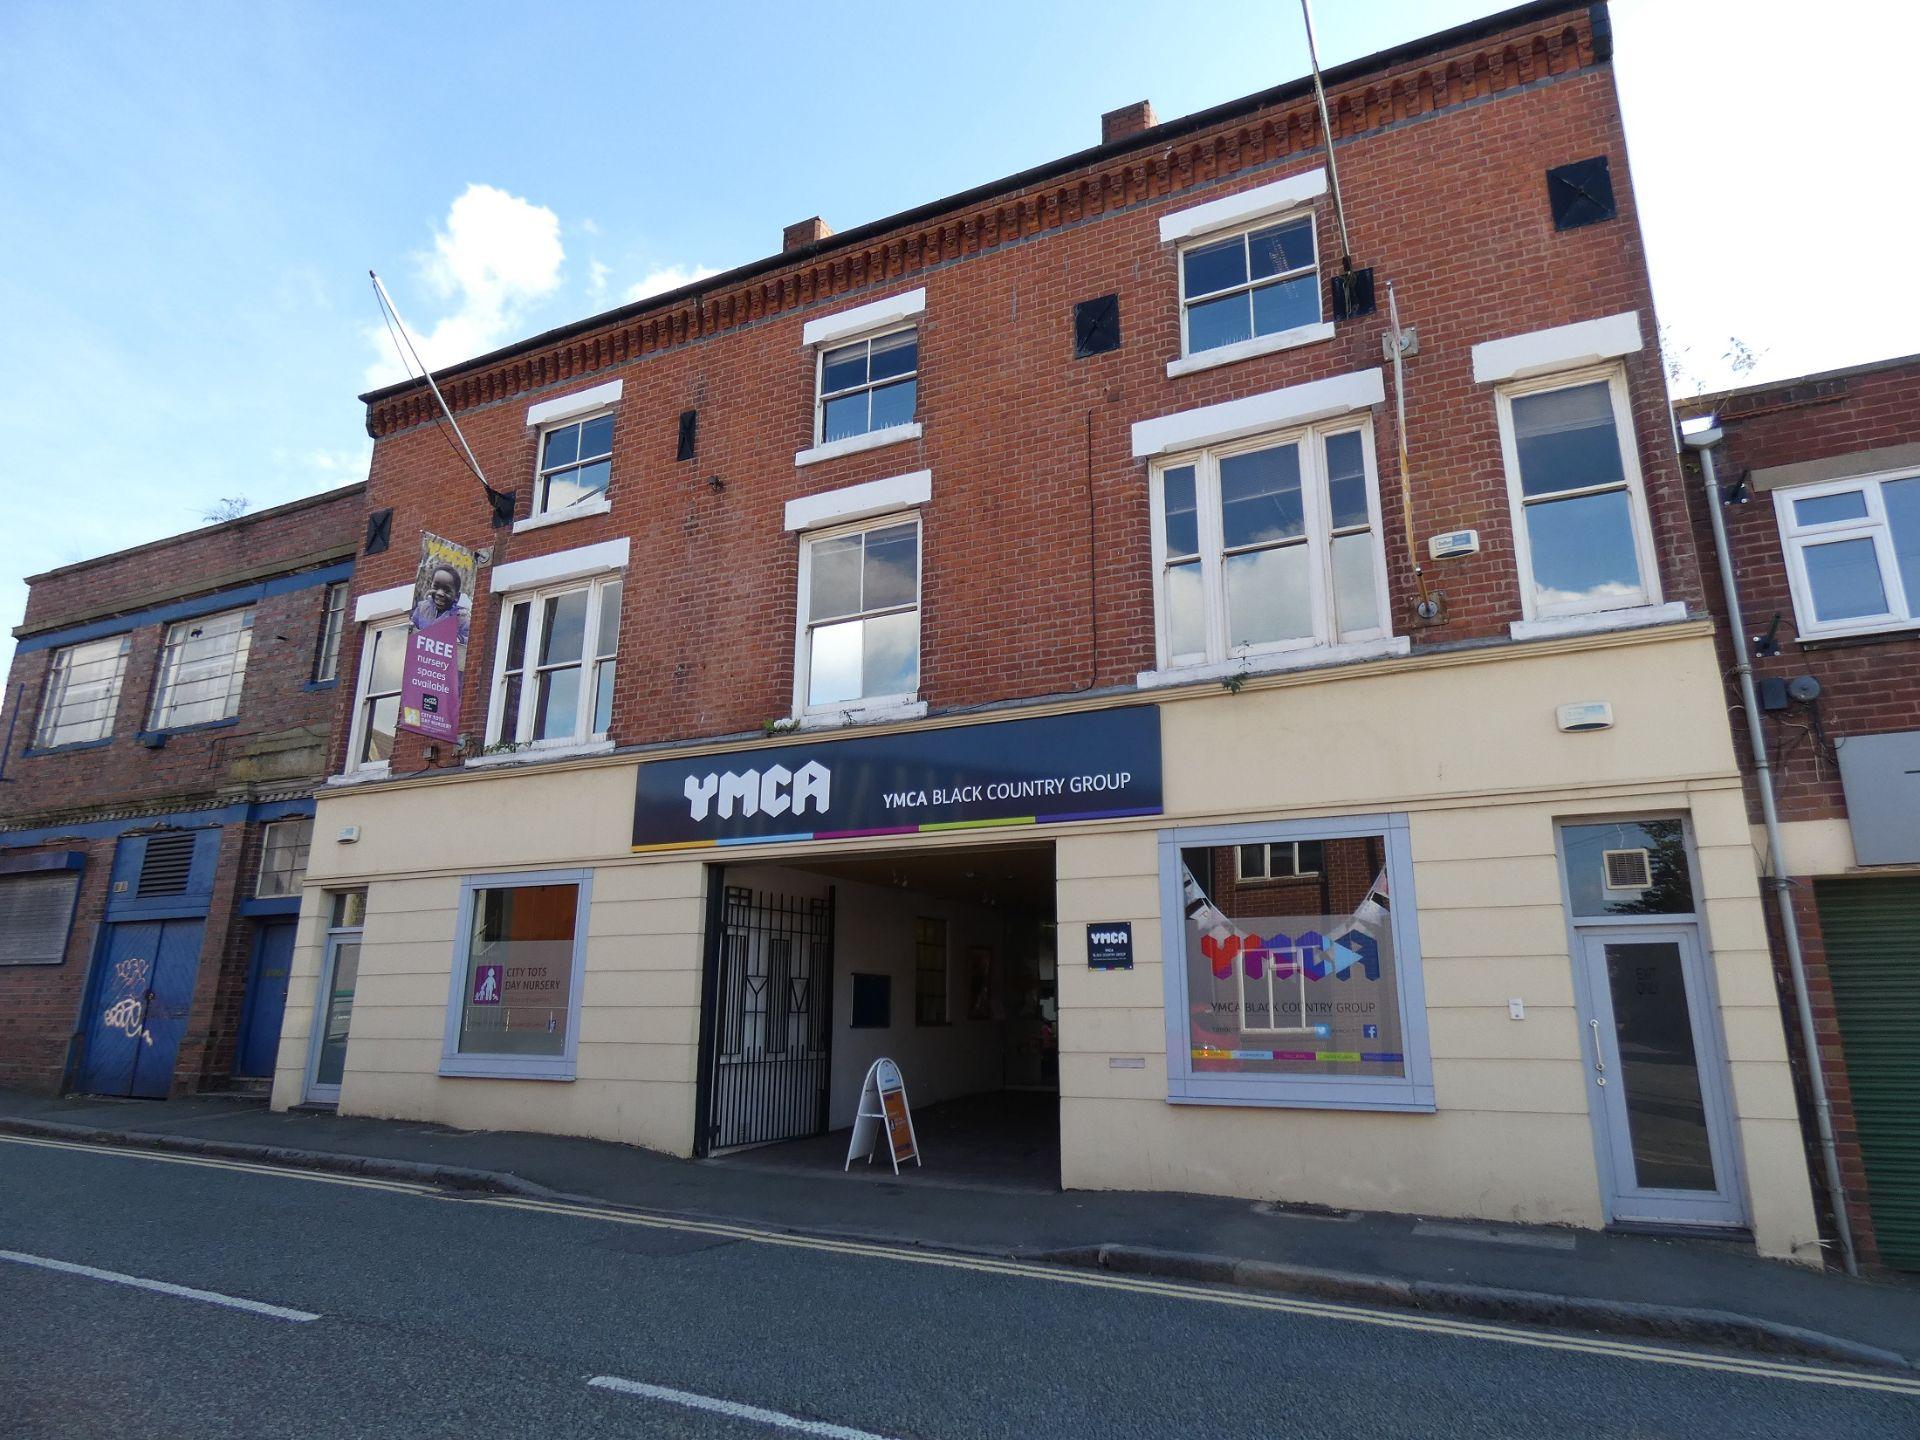 29-31 Temple Street - 29-31 Temple Street, Wolverhampton, WV2 4AN